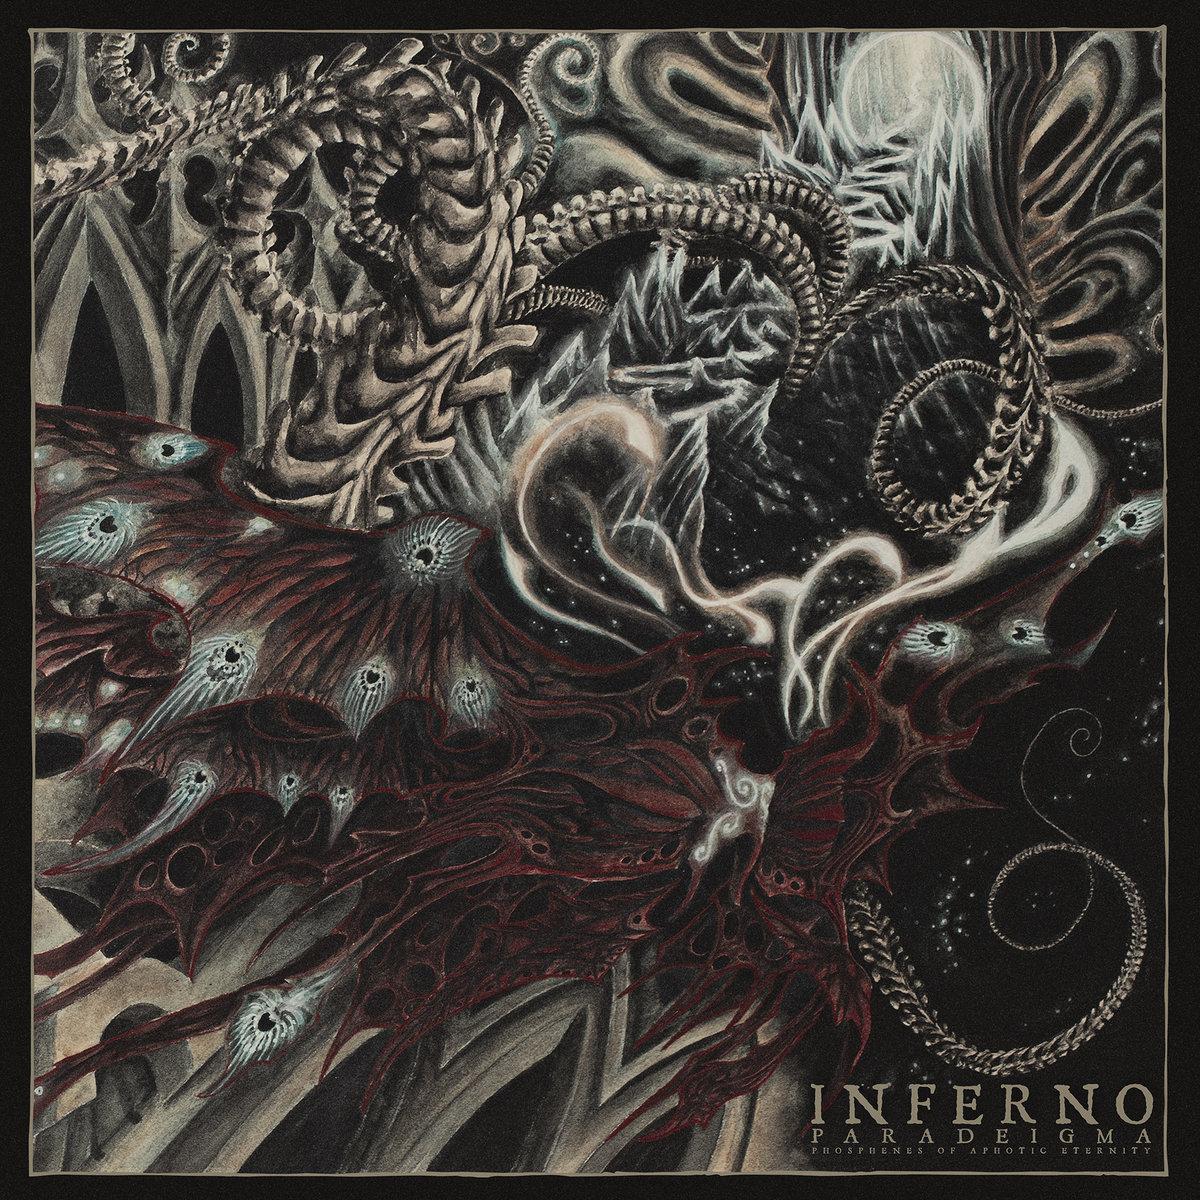 Inferno PARADEIGMA (Phosphenes of Aphotic Eternity) Album Cover Artwork